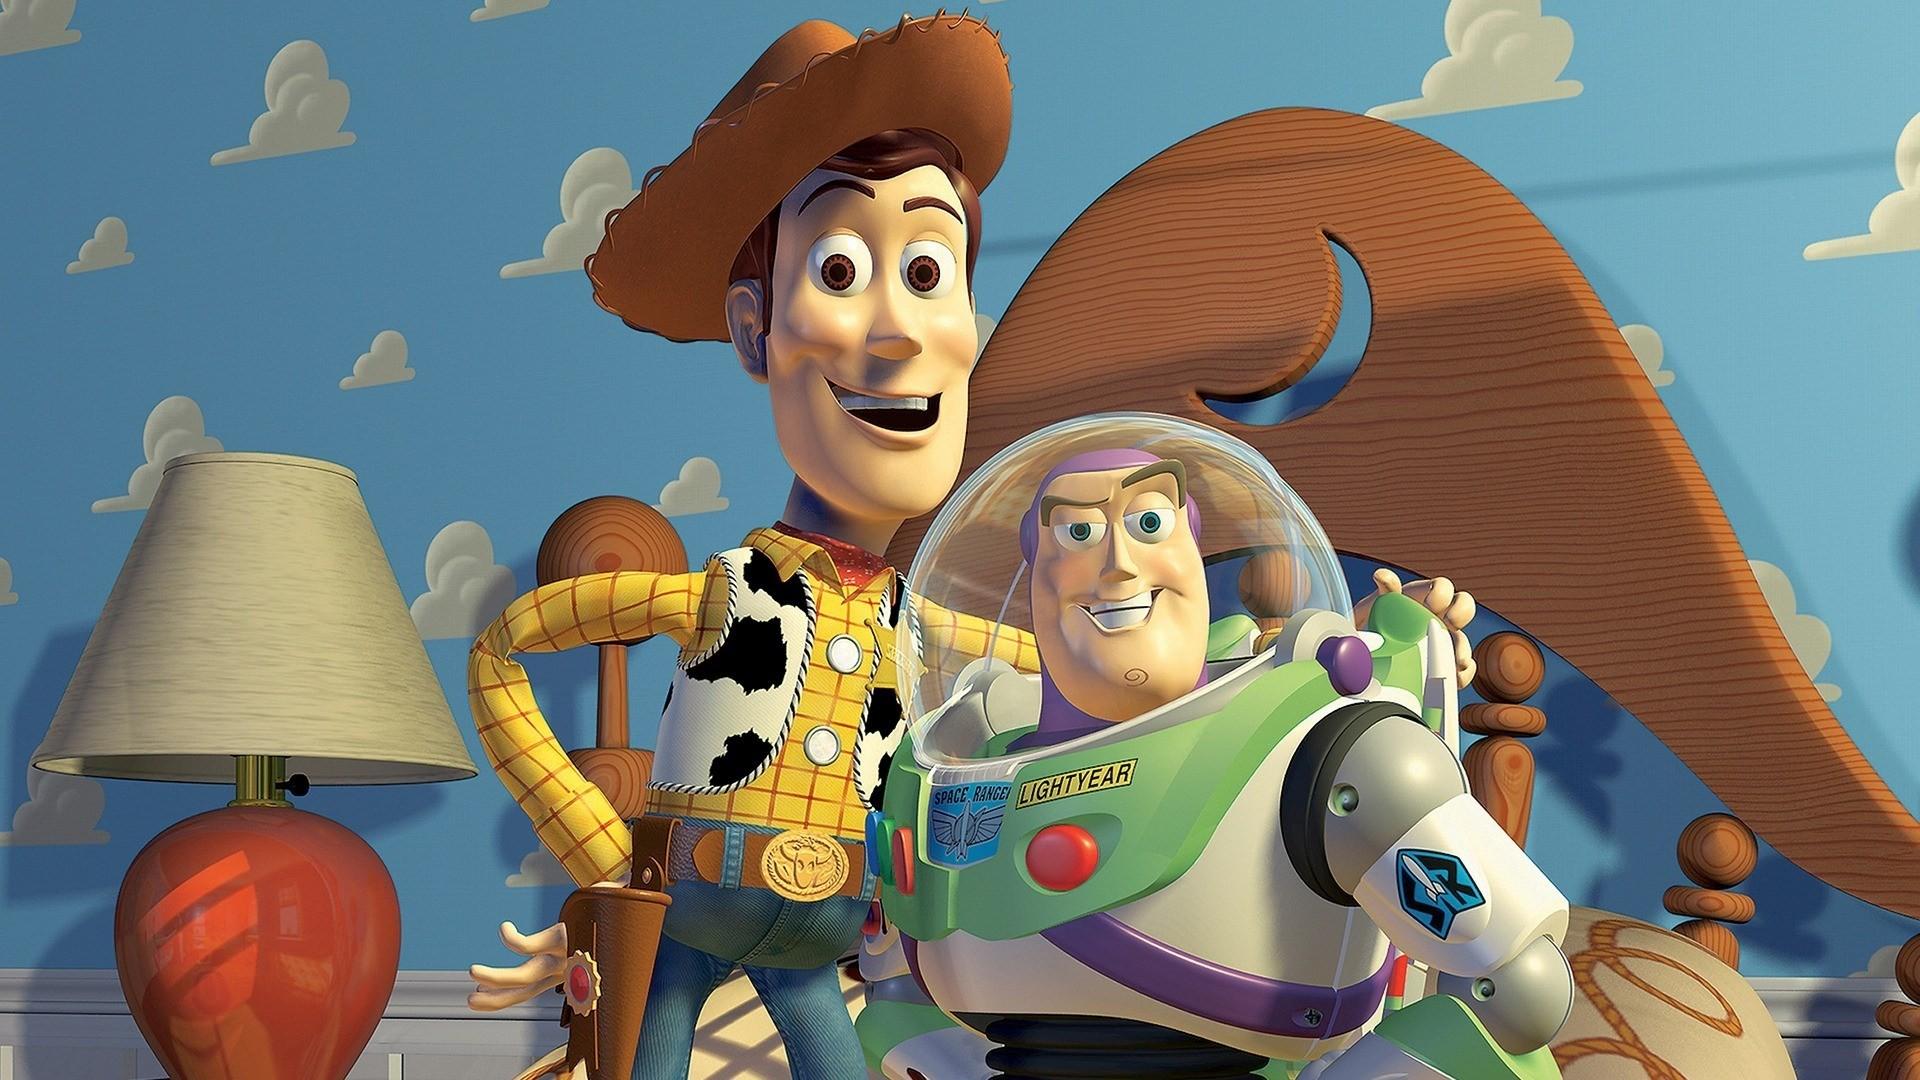 Toy Story Wallpaper For Desktop 55 Images